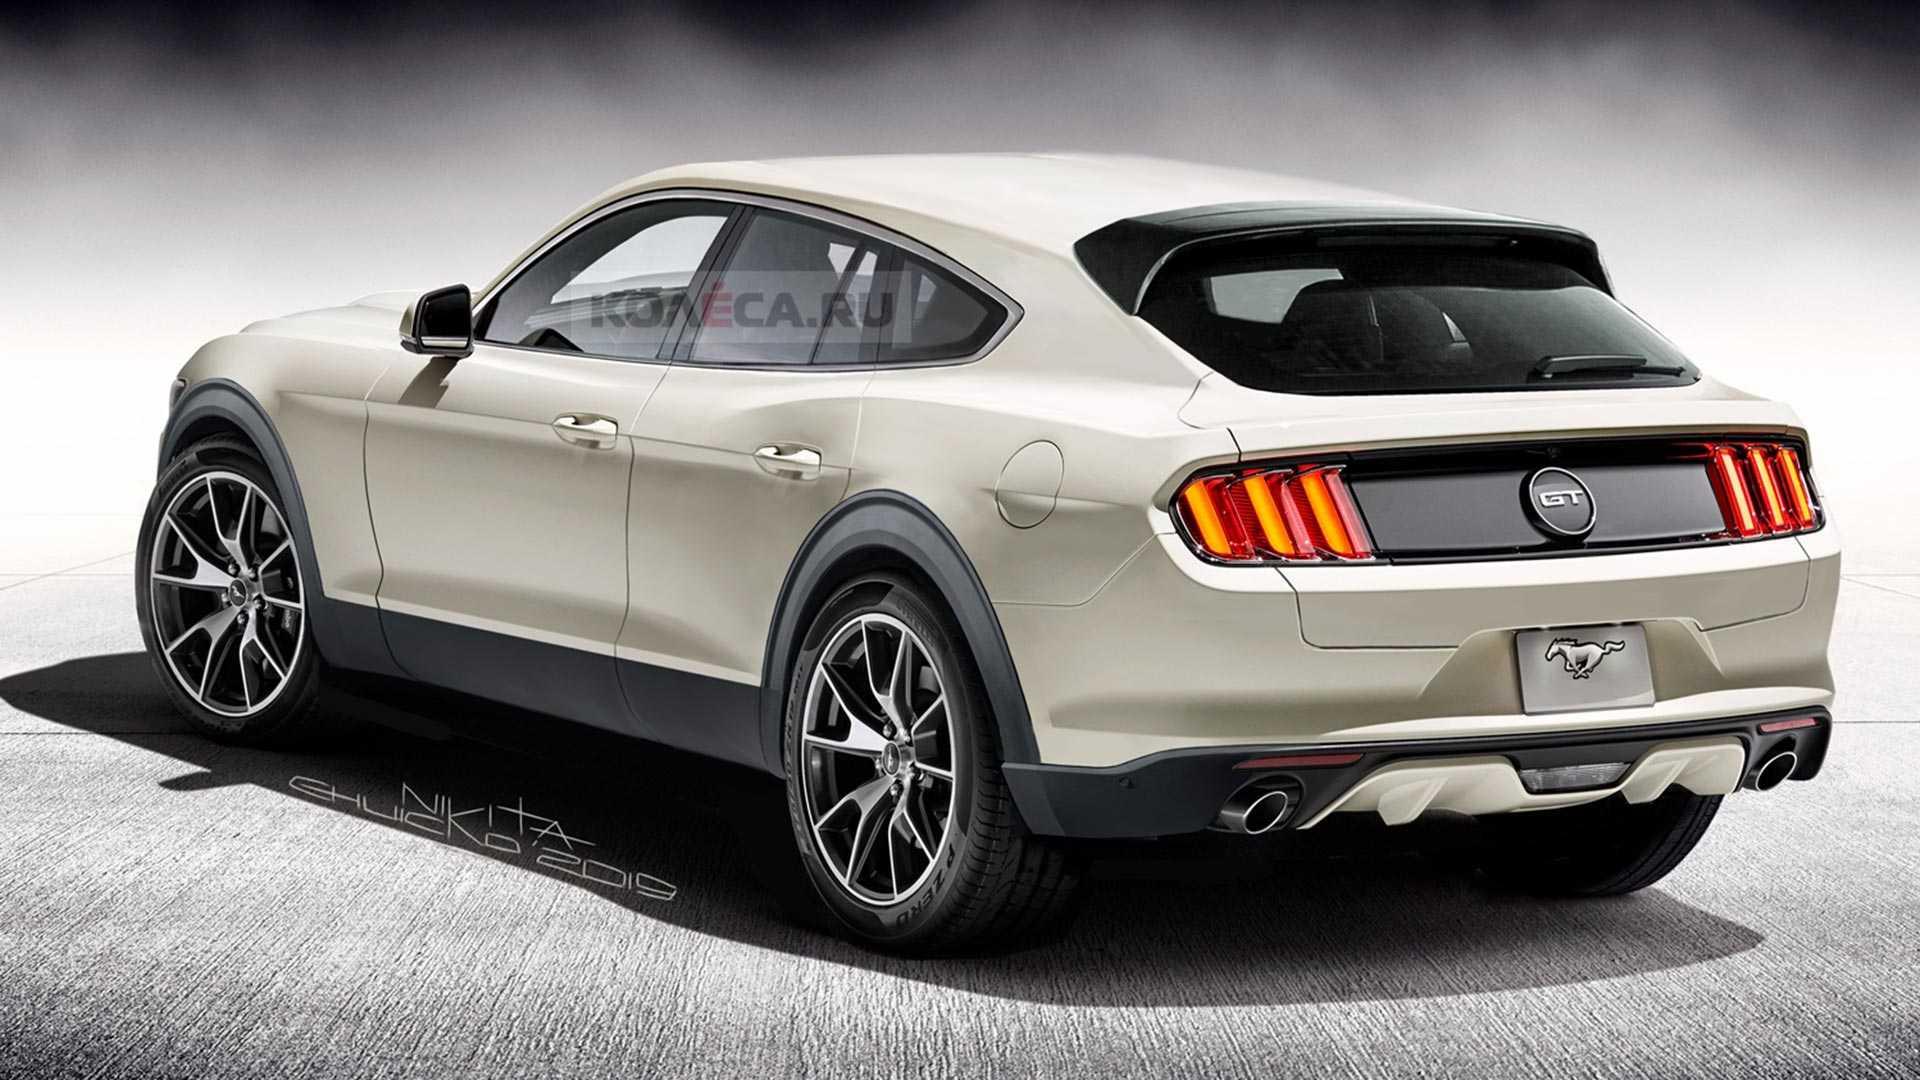 Ford วางแผนขยายกองทัพ เปลี่ยน Mustang เป็นรถไฟฟ้าในร่างของ Crossover อาจเผยโฉมปี 2020 4